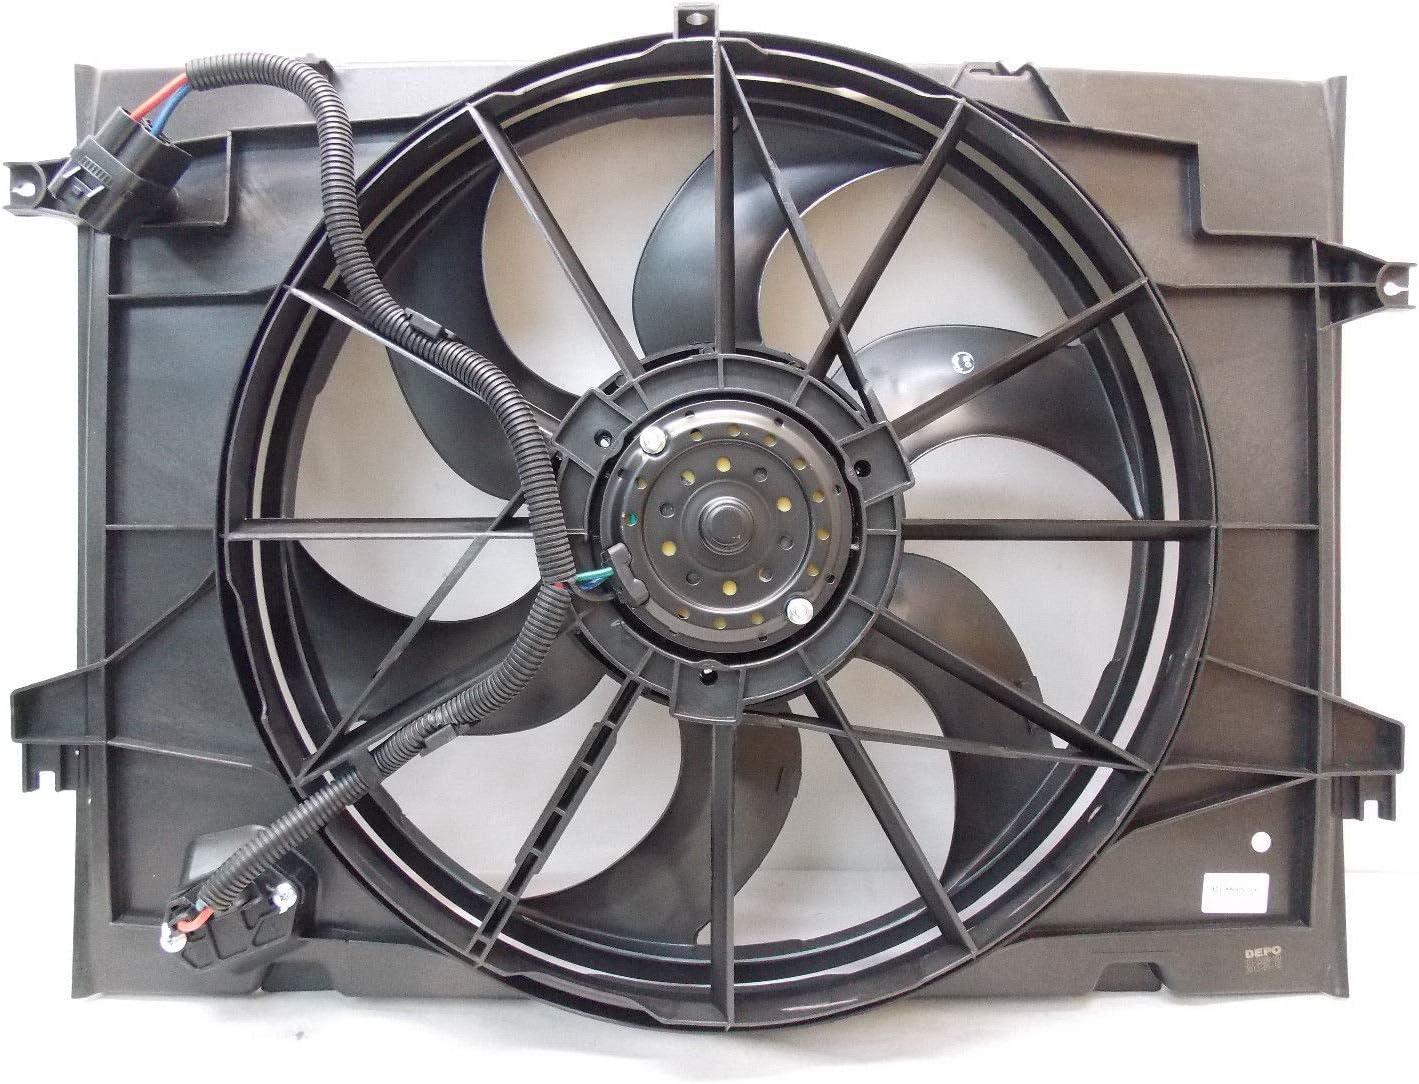 Automotive Cooling Radiator And Condenser Fan For Hyundai Tucson Kia Sportage KI3115115 100% Tested